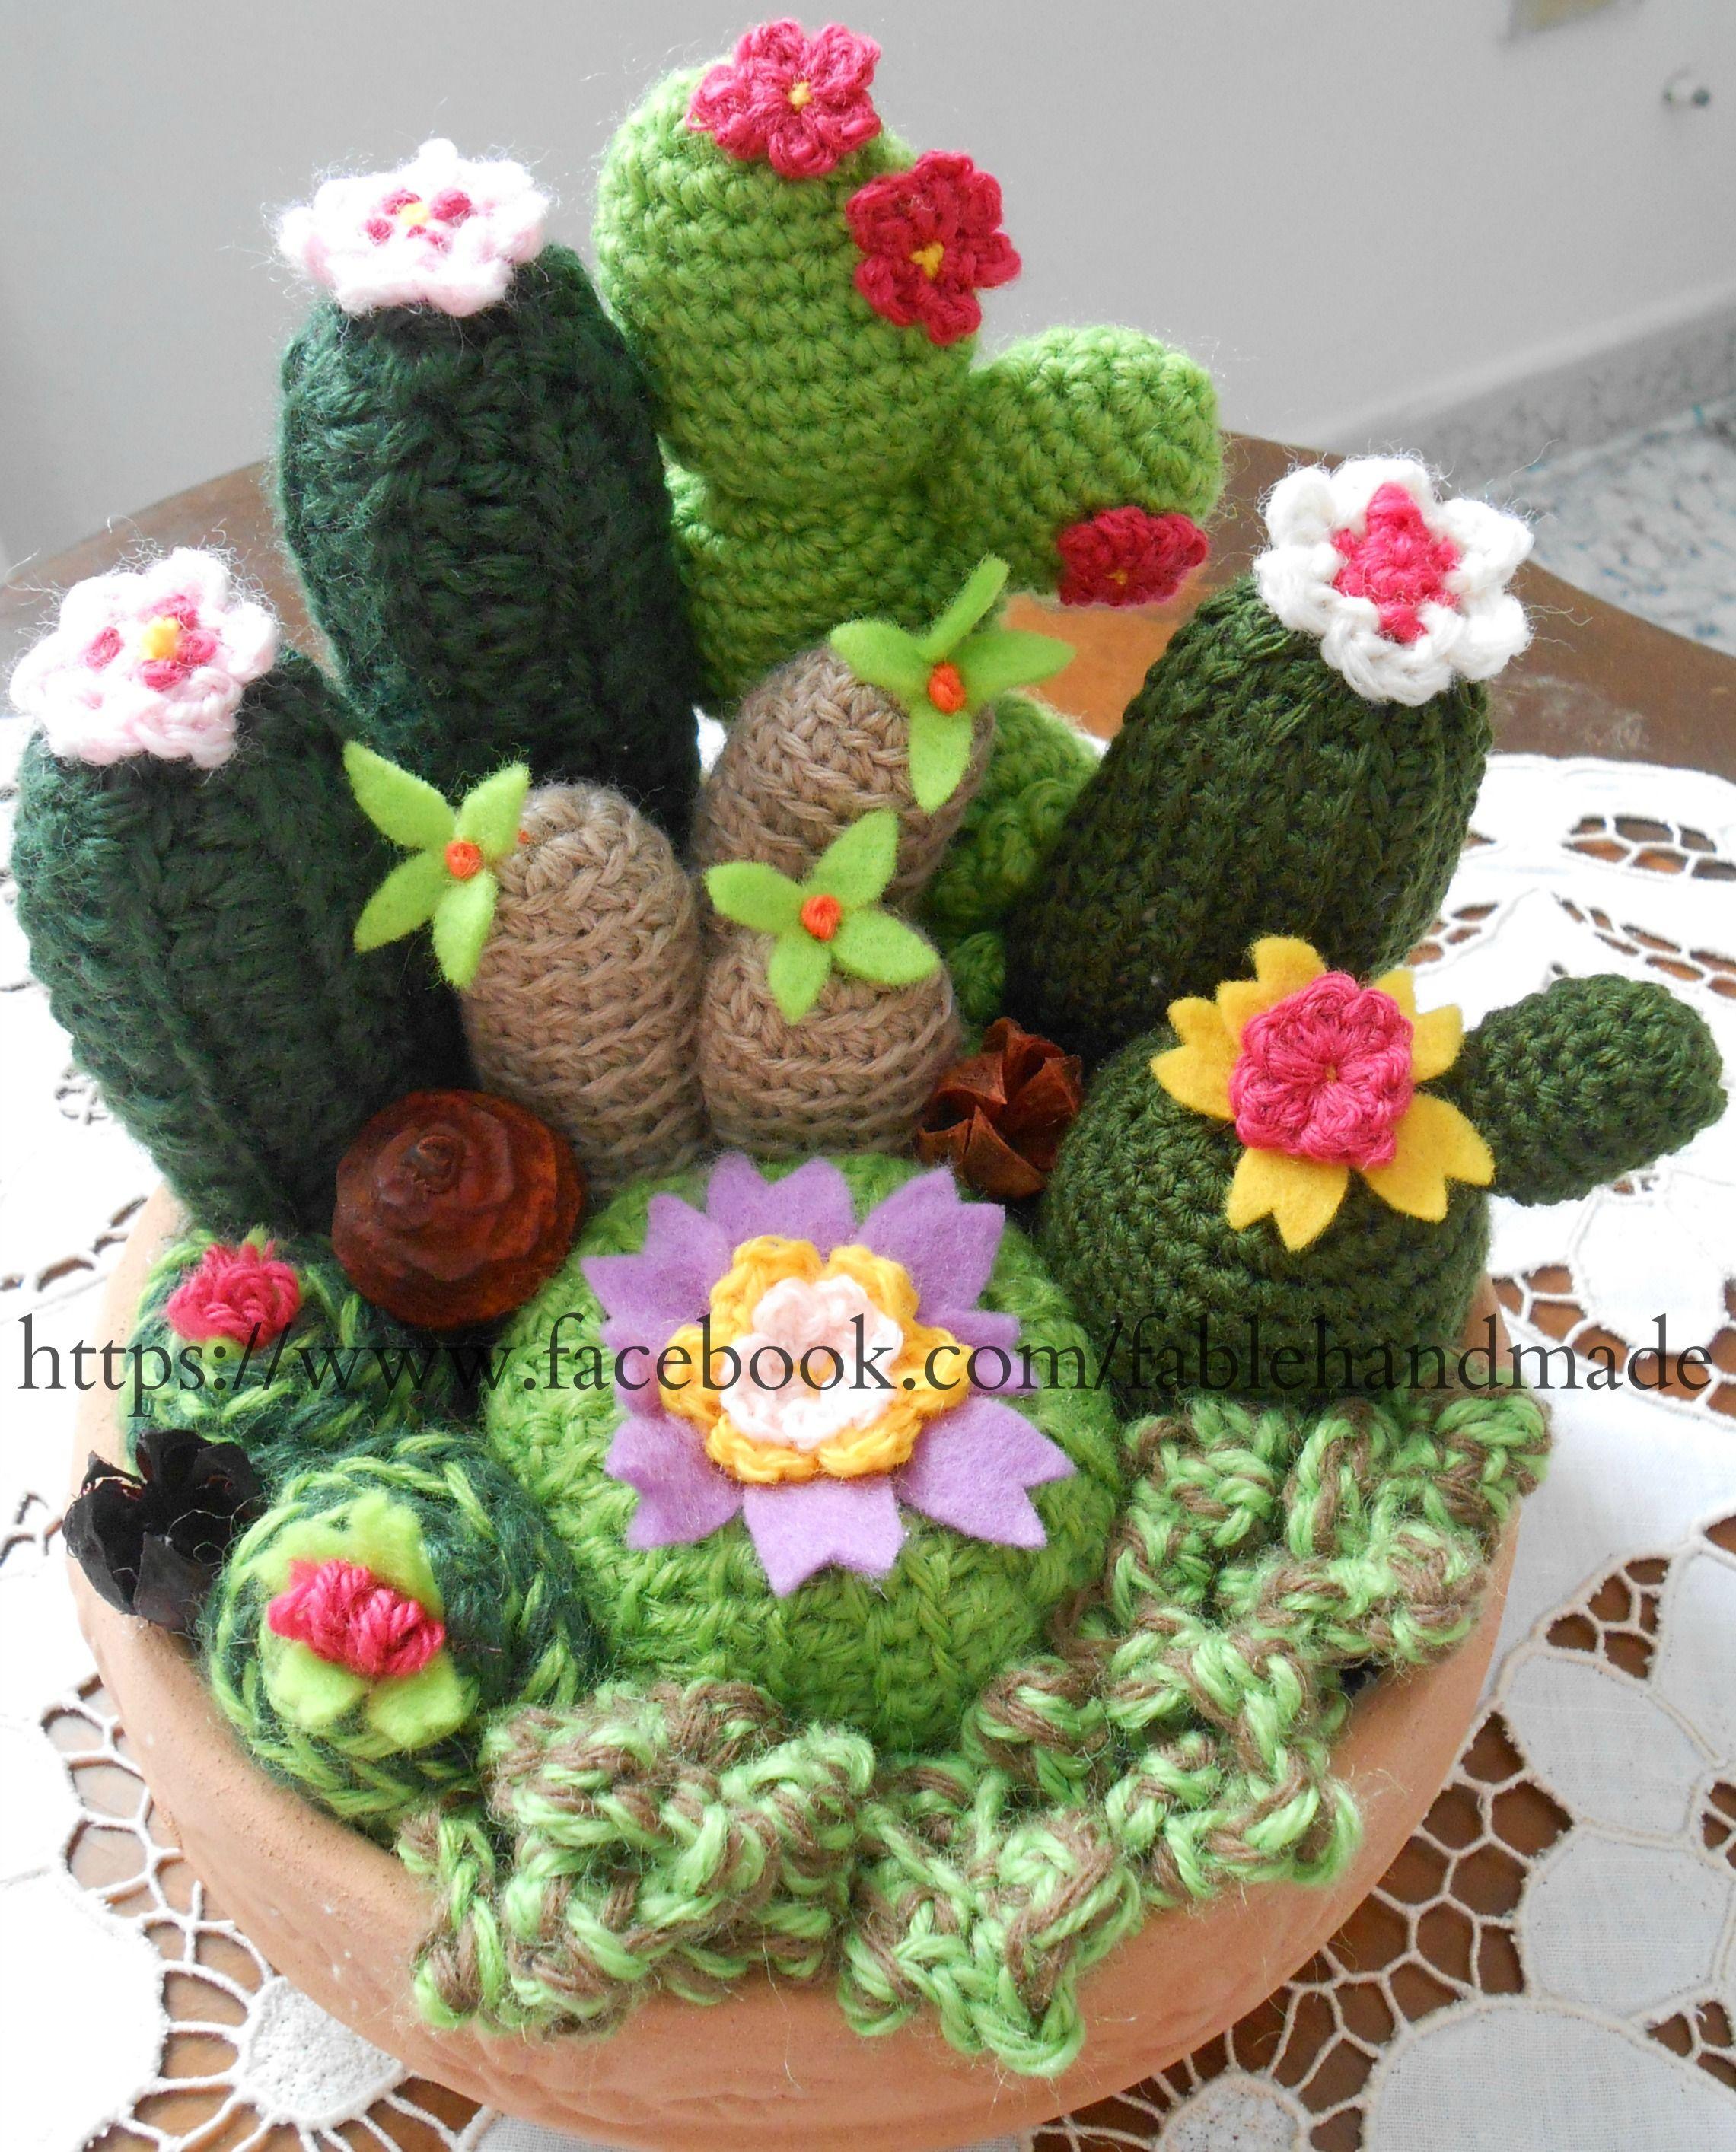 Crochet Cactus Garden 2017 And Holding Crochet Cactus